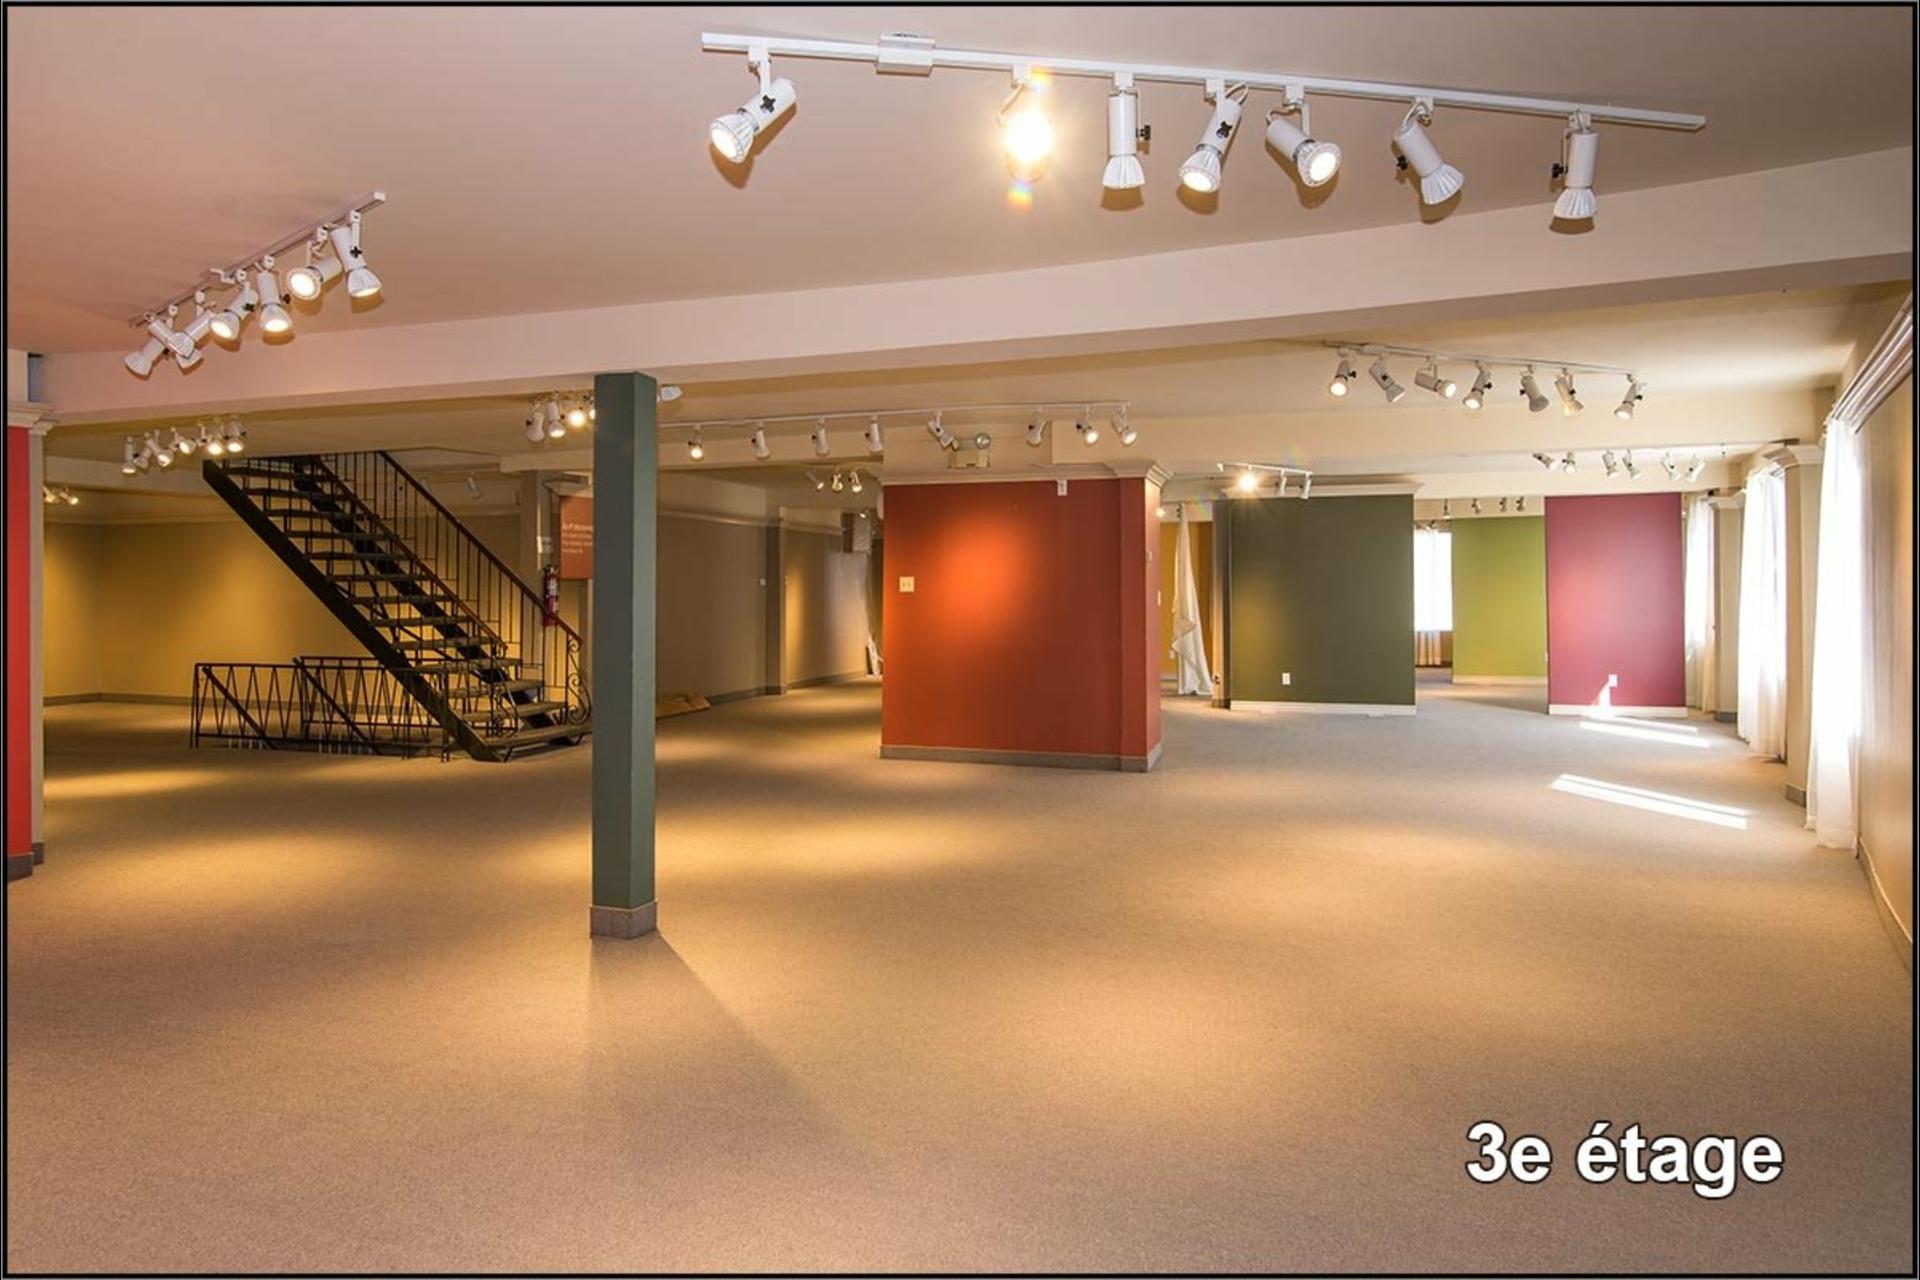 image 8 - Bureau À vendre Saint-Raymond